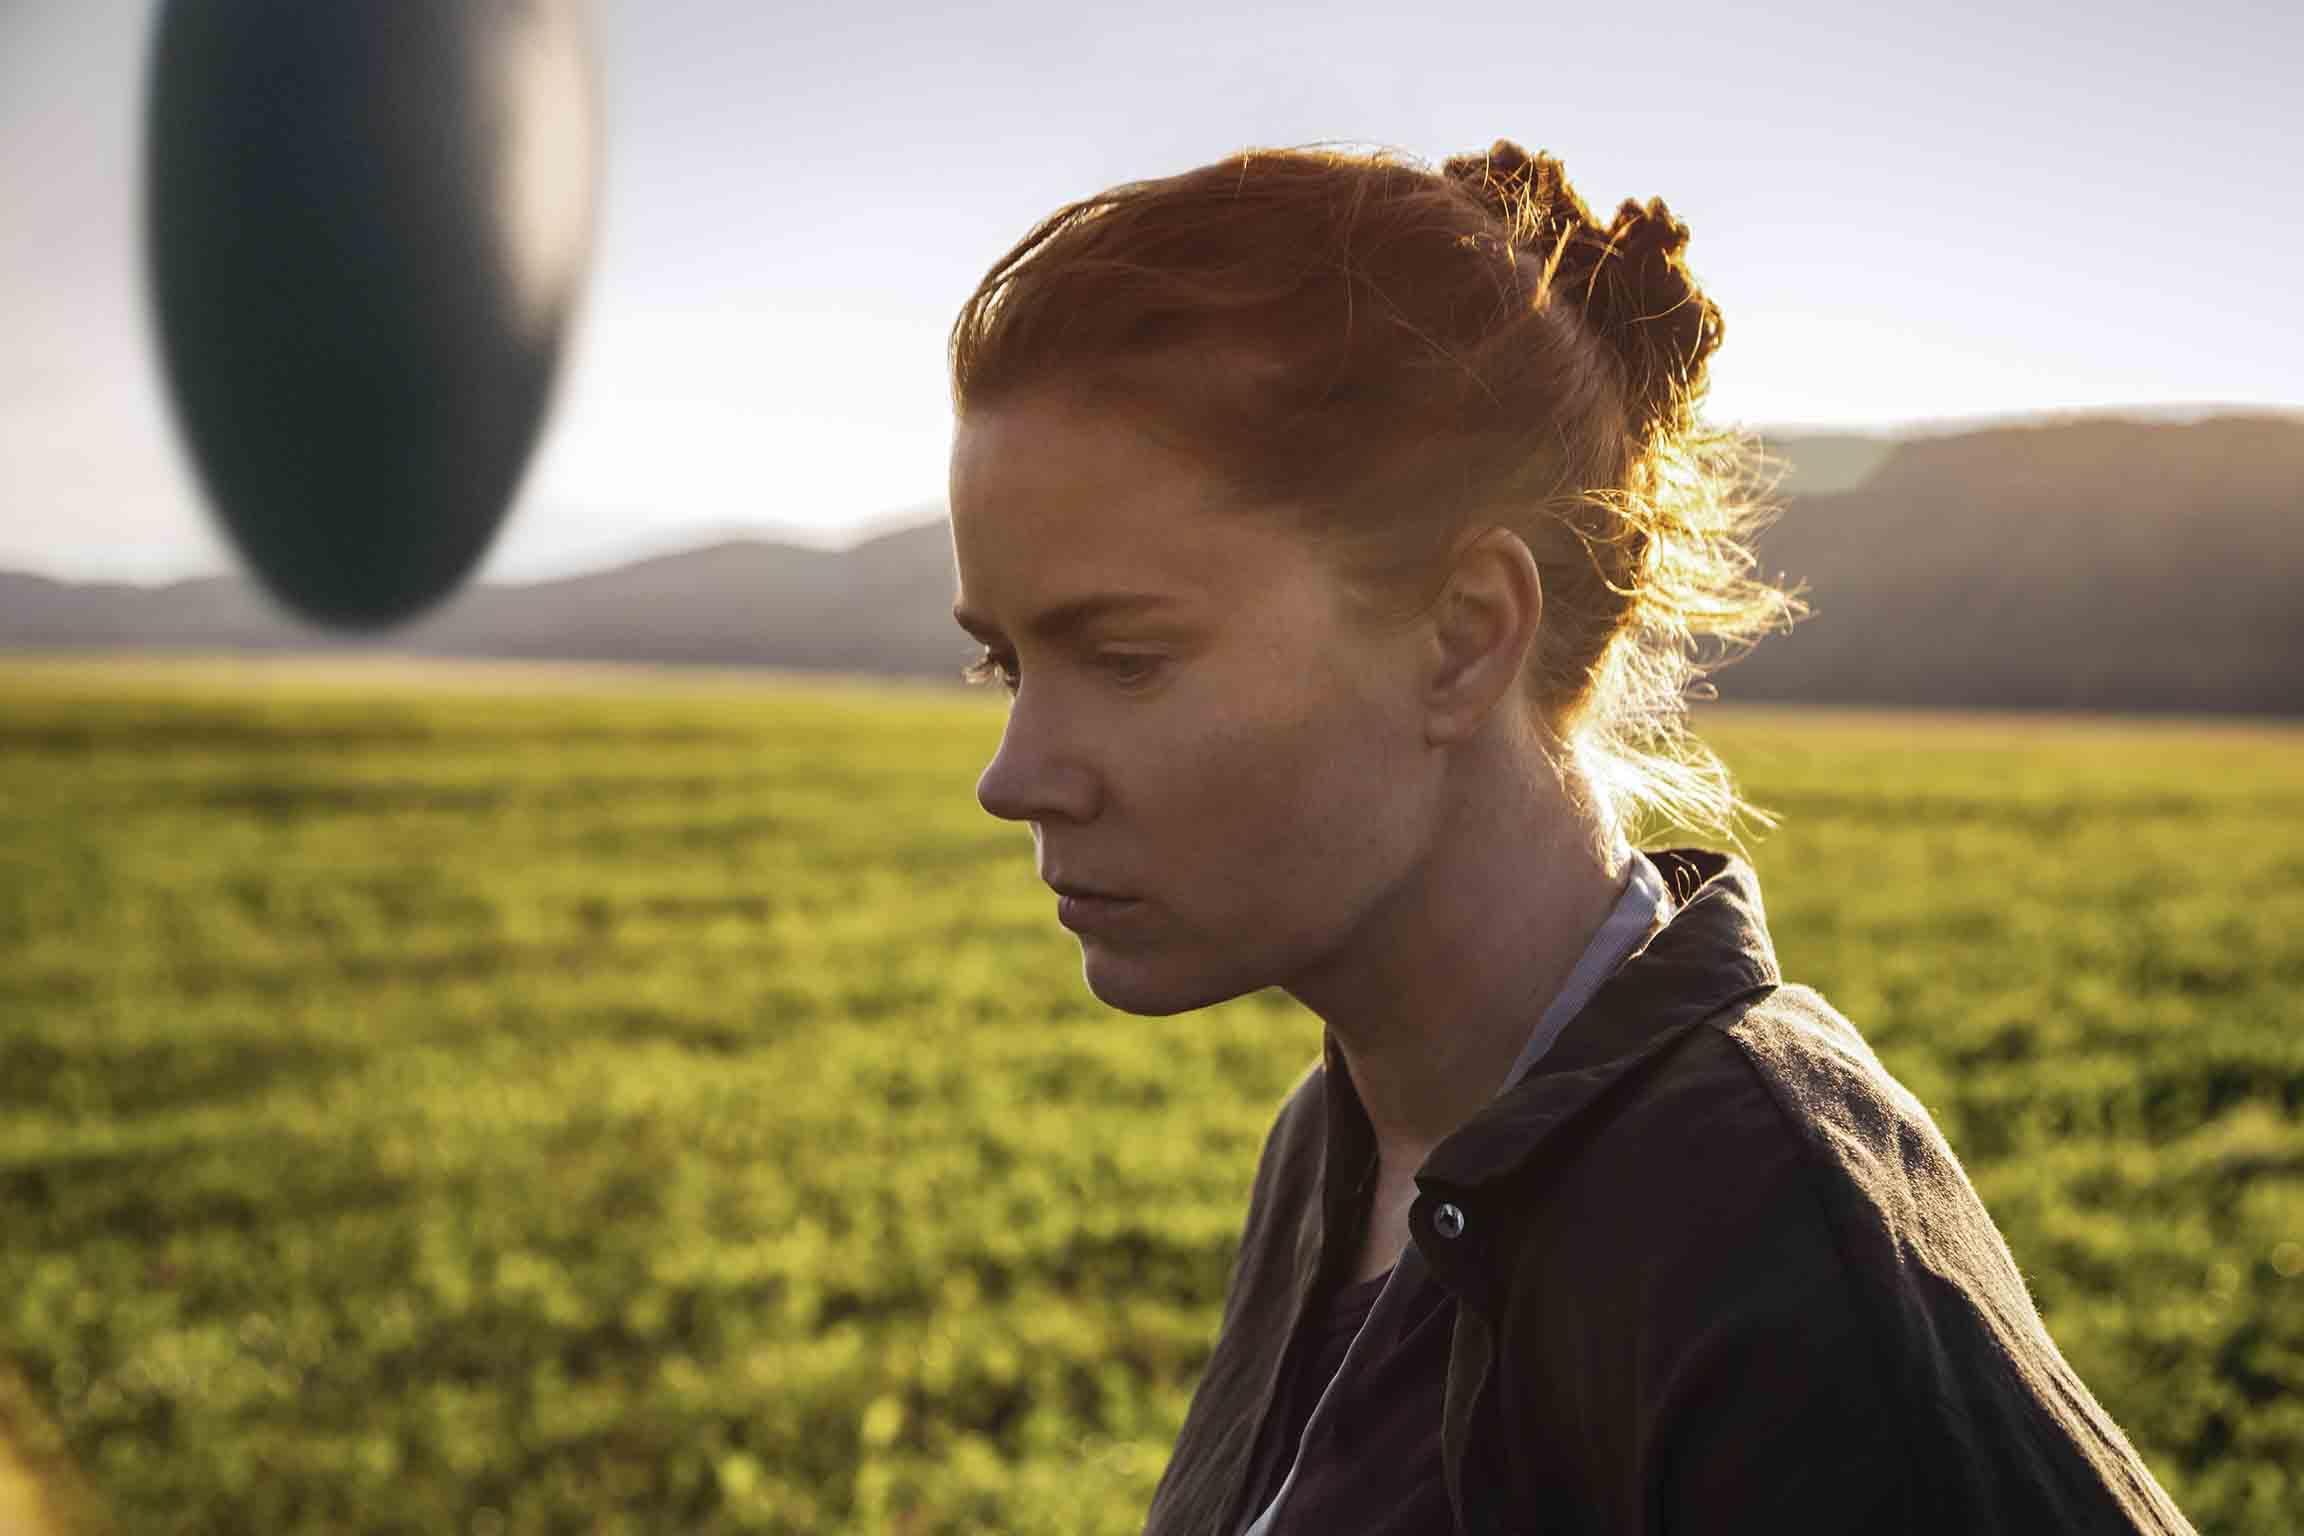 Amy Adams stars in 'Arrival', directed by Denis Villeneuve.